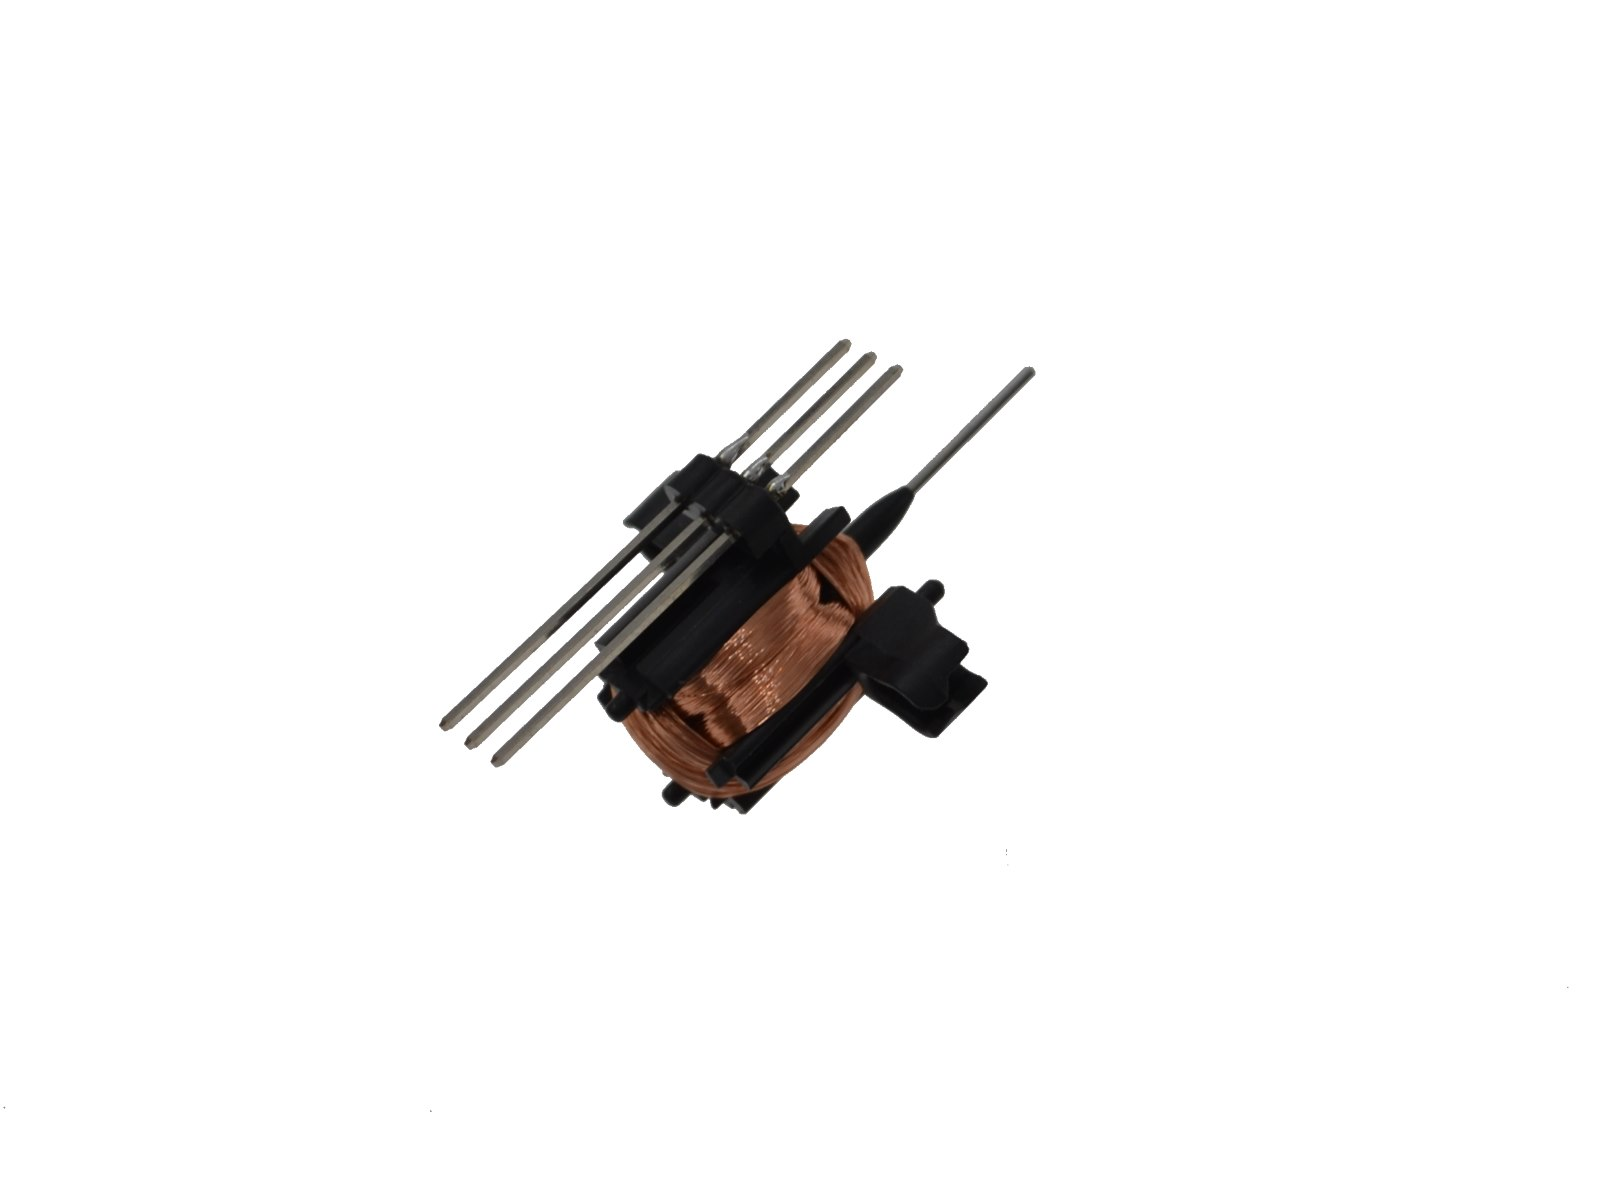 Schrittmotor für Citroen Berlingo/Evasion Kombiinstrument Reparatur